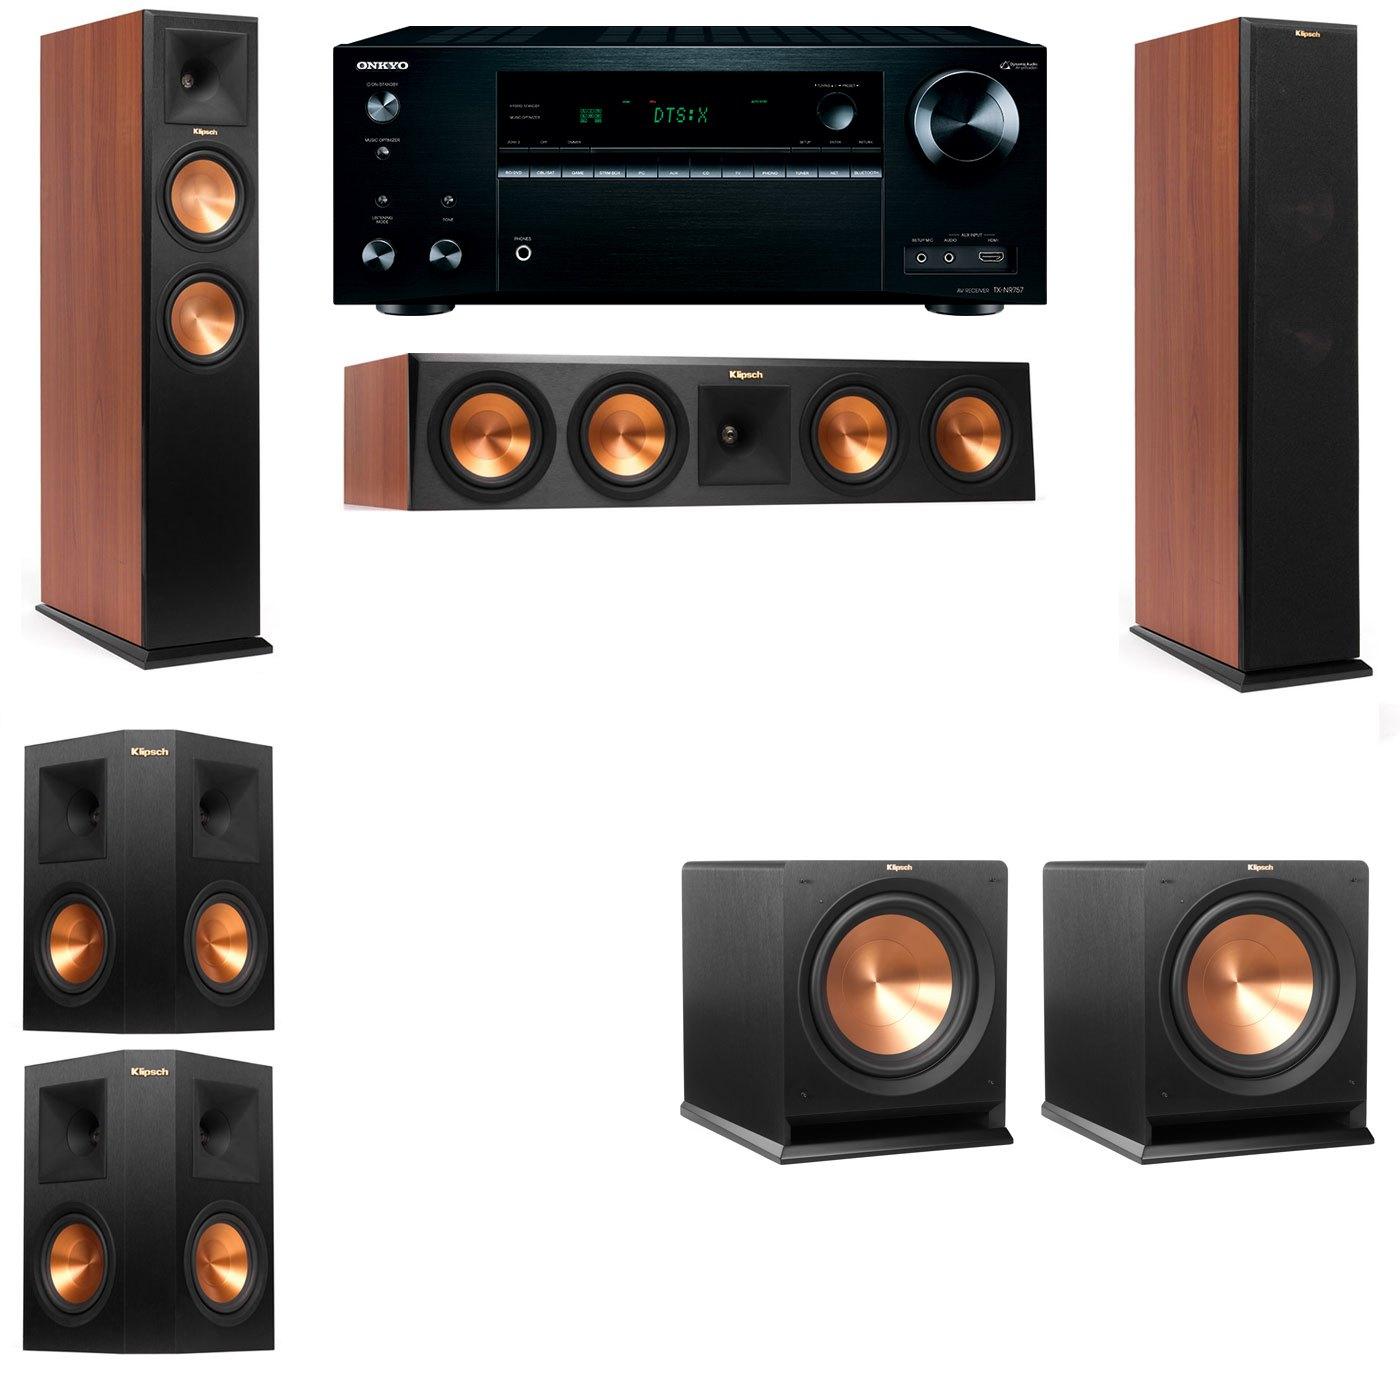 Klipsch RP-250F Tower Speakers CH-R112SW-5.2-Onkyo TX-NR757